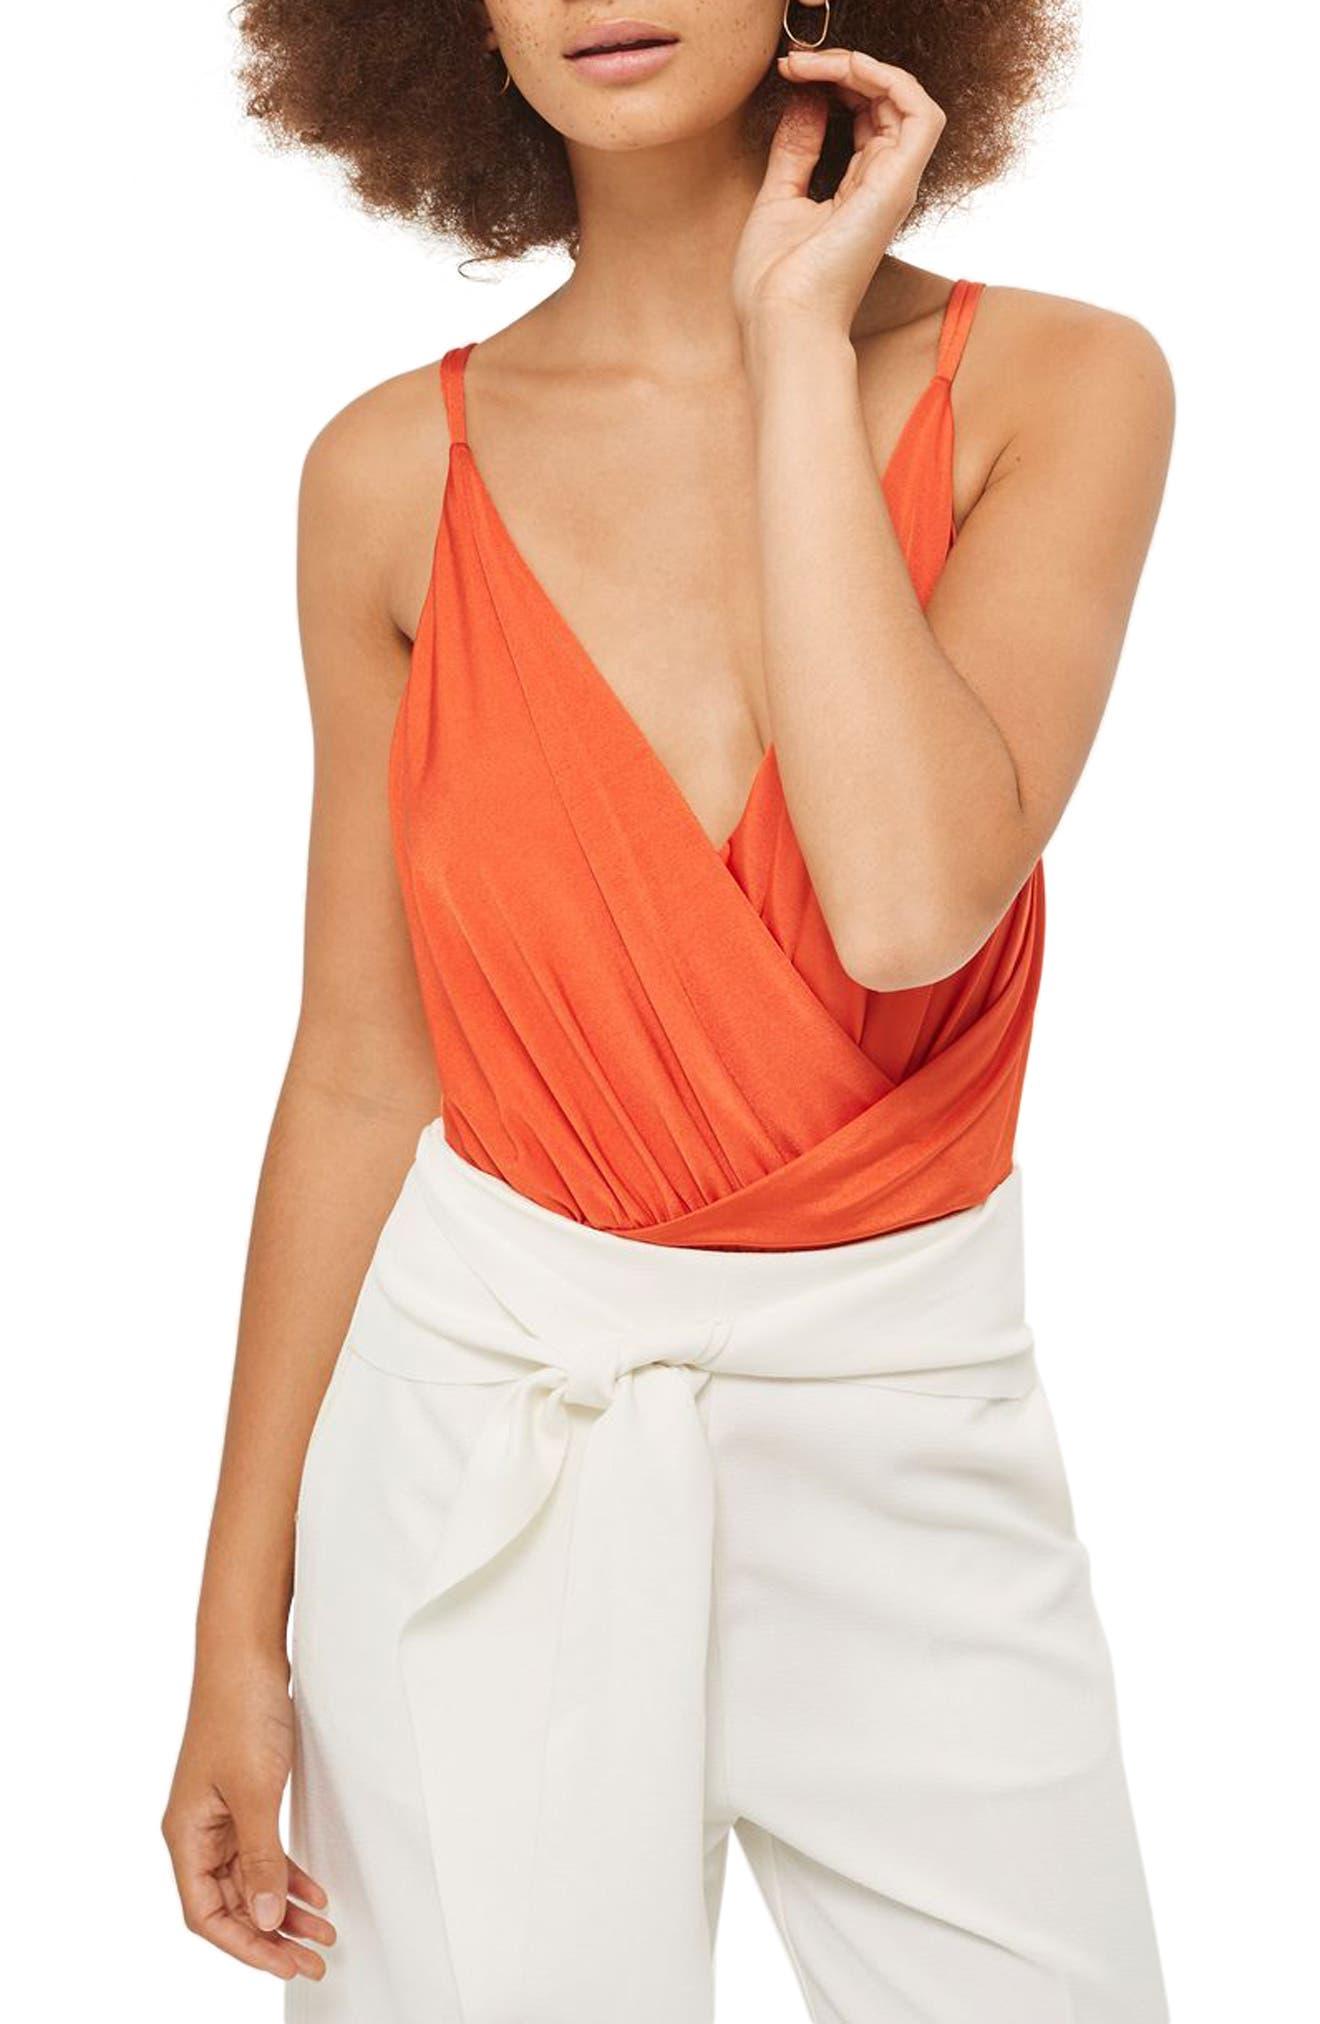 Topshop Strappy Wrap Bodysuit